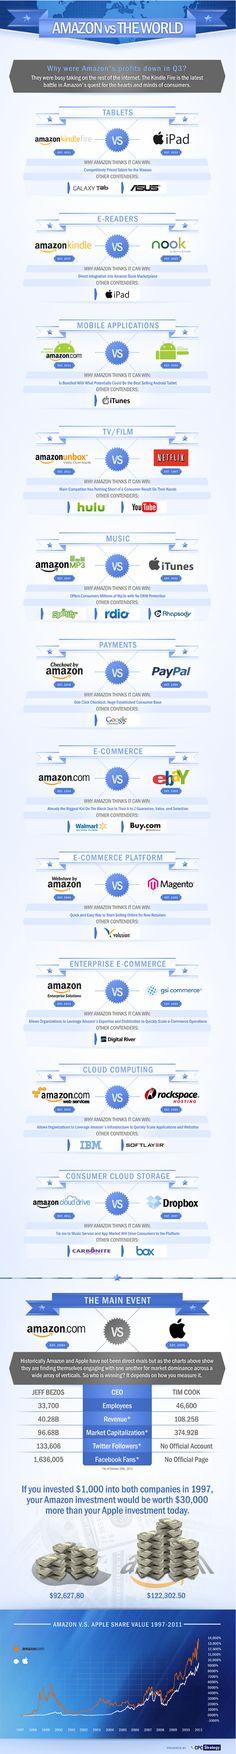 Amazon vs The World – An Infographic Vs The World, Rest Of The World, Information Graphics, Internet Marketing, Online Marketing, Digital Marketing, Big Data, Data Visualization, Web 2